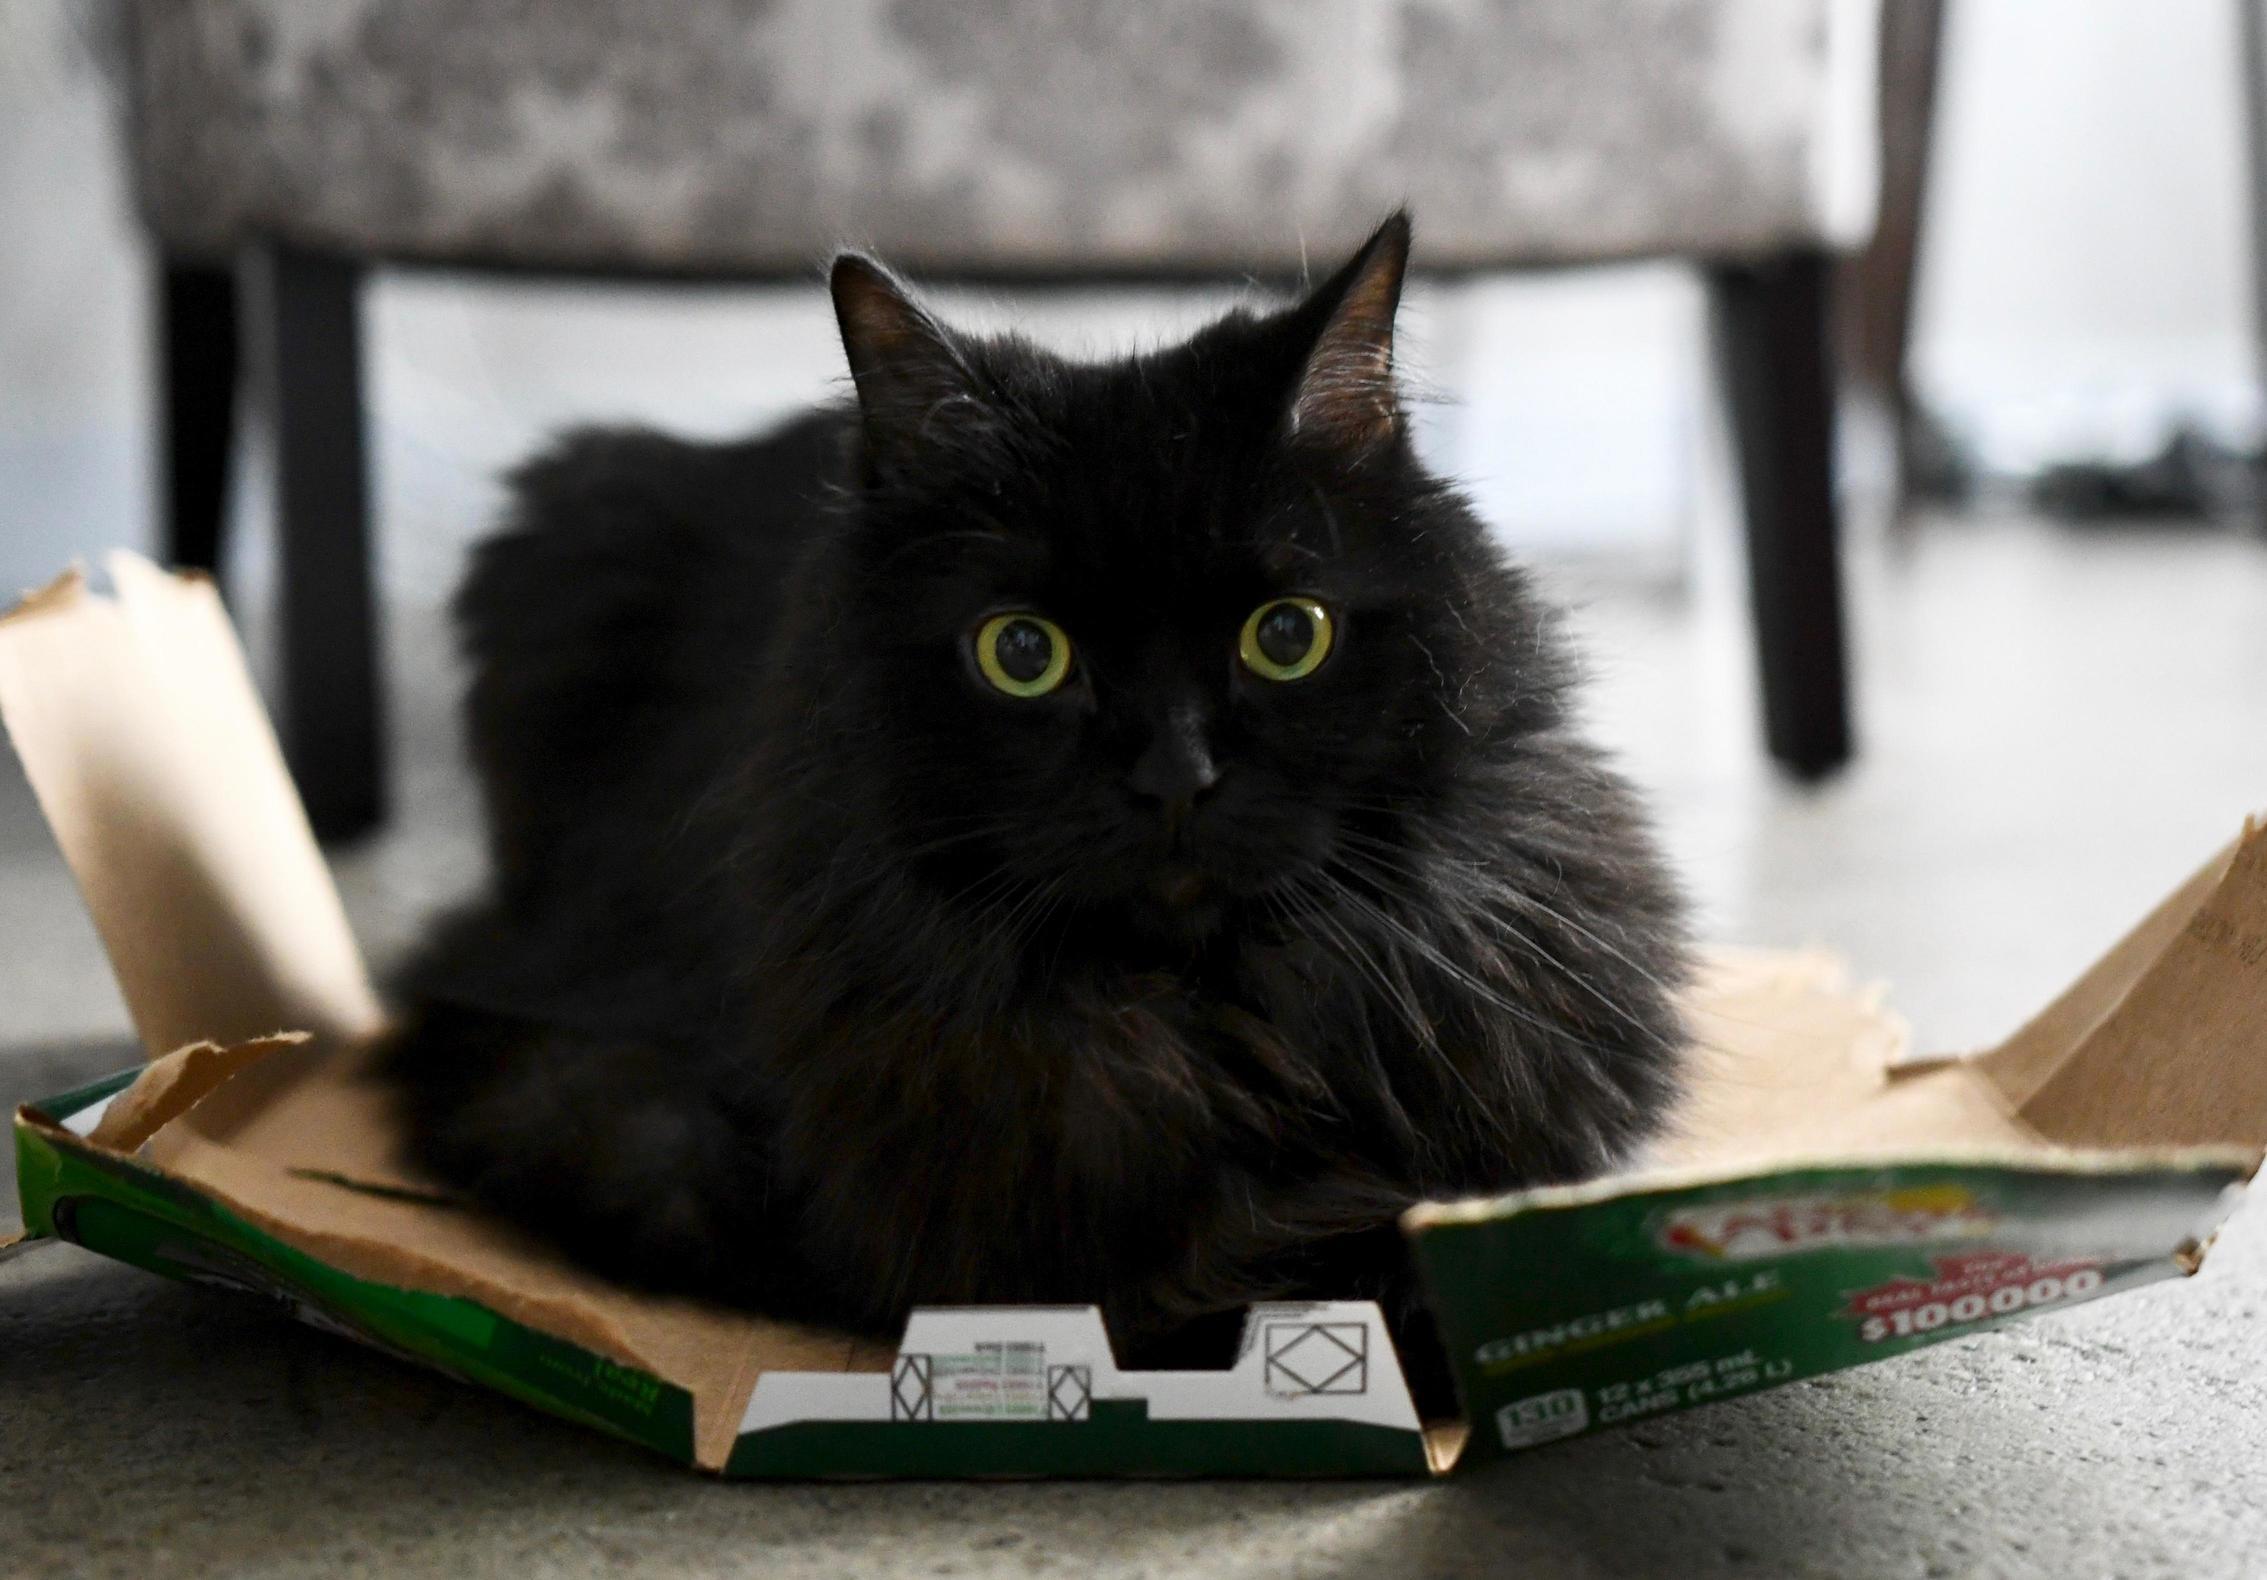 I think she likes cardboard